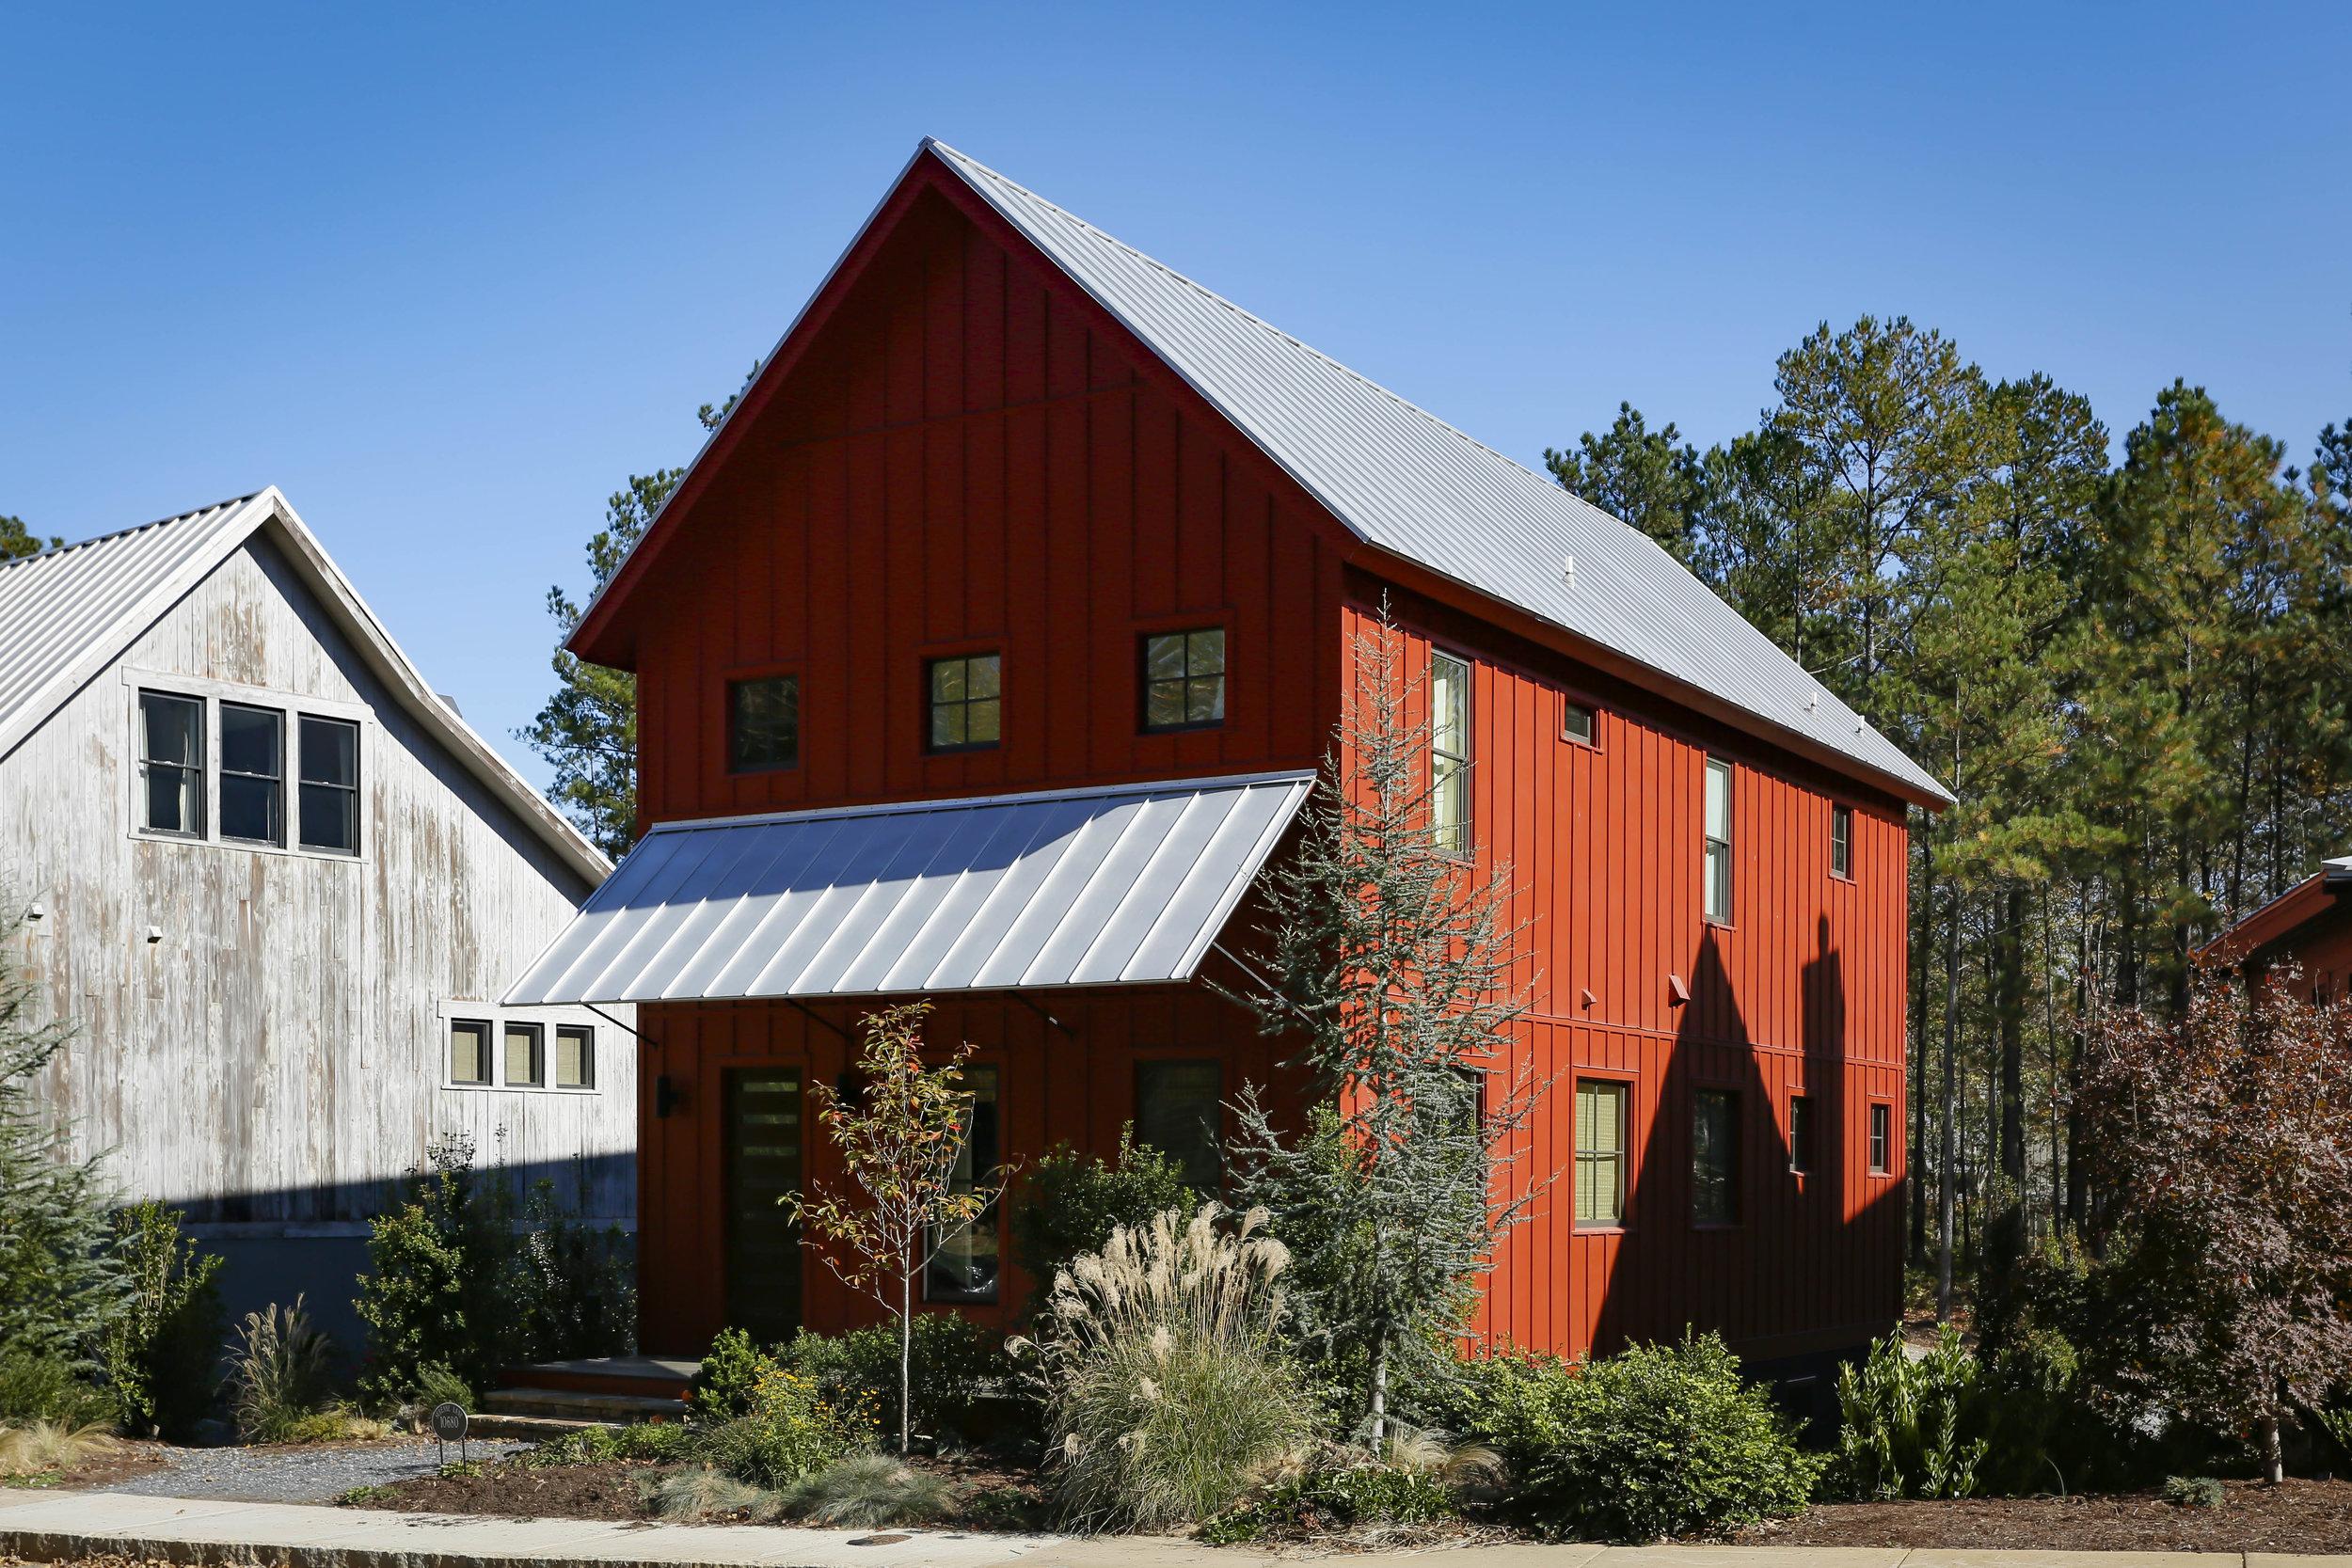 Contemporary Farmhouse   4 Beds 3.5 Baths 2,116 sqft  Serenbe Community  Chattahoochee Hills, GA